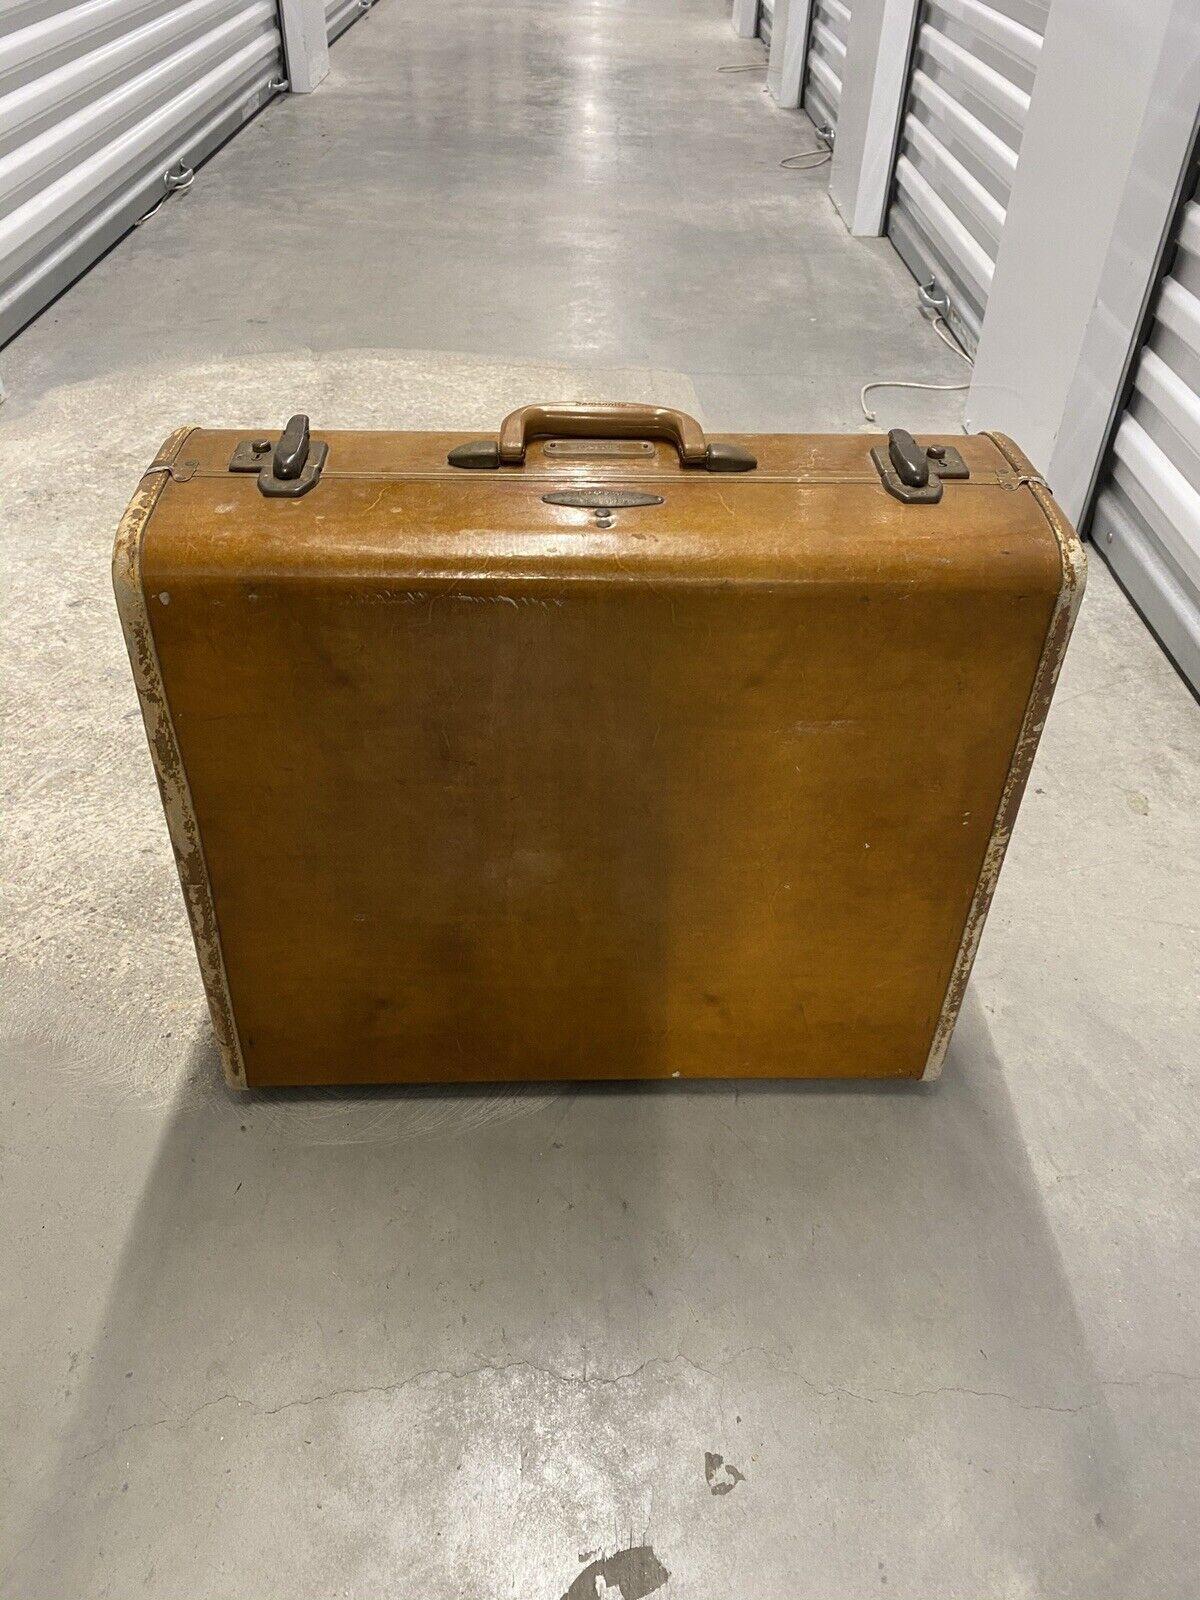 Vintage Brown Suitcase Luggage Hardshell 21 X 12 X 8  - $13.50